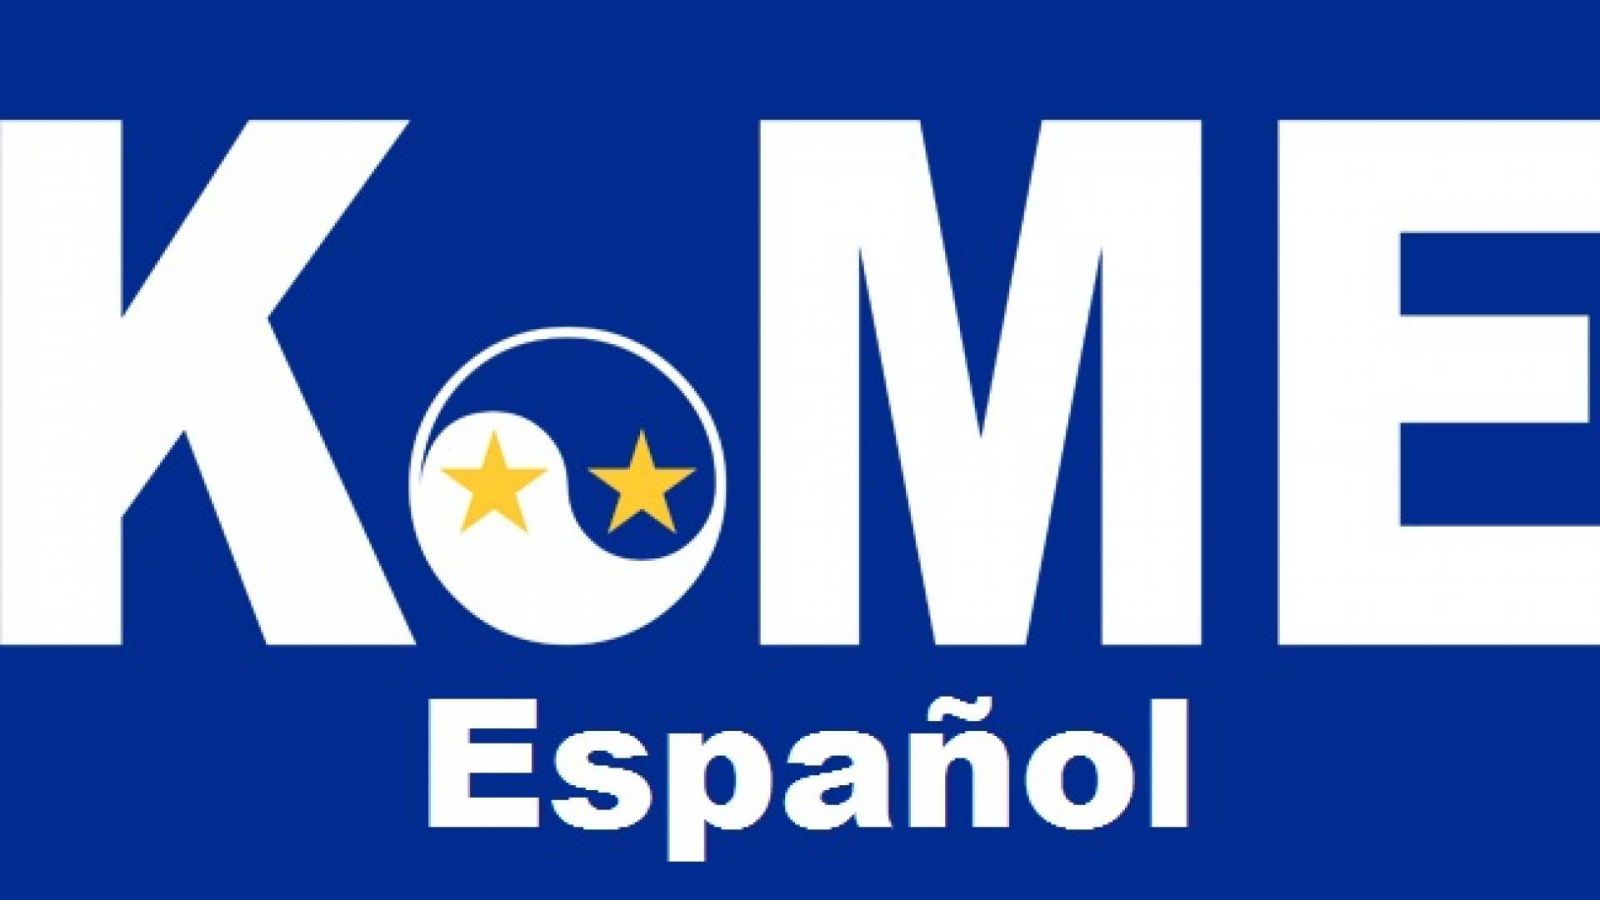 KoME Español finalmente abre sus puertas © KoME